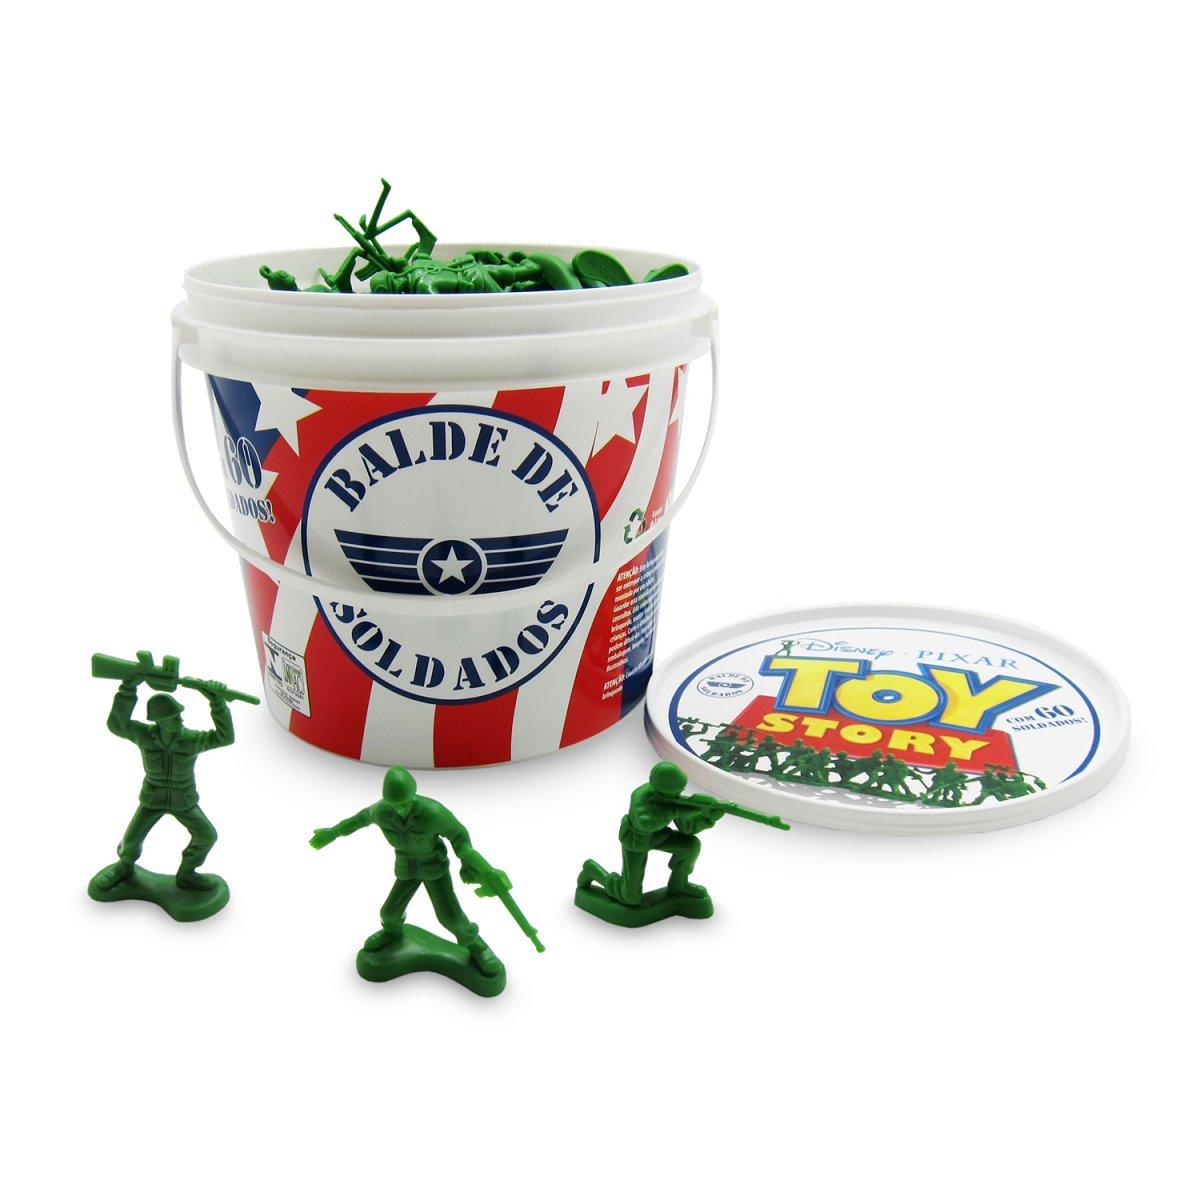 Balde Soldadinhos Toy Story - Toyng 026772